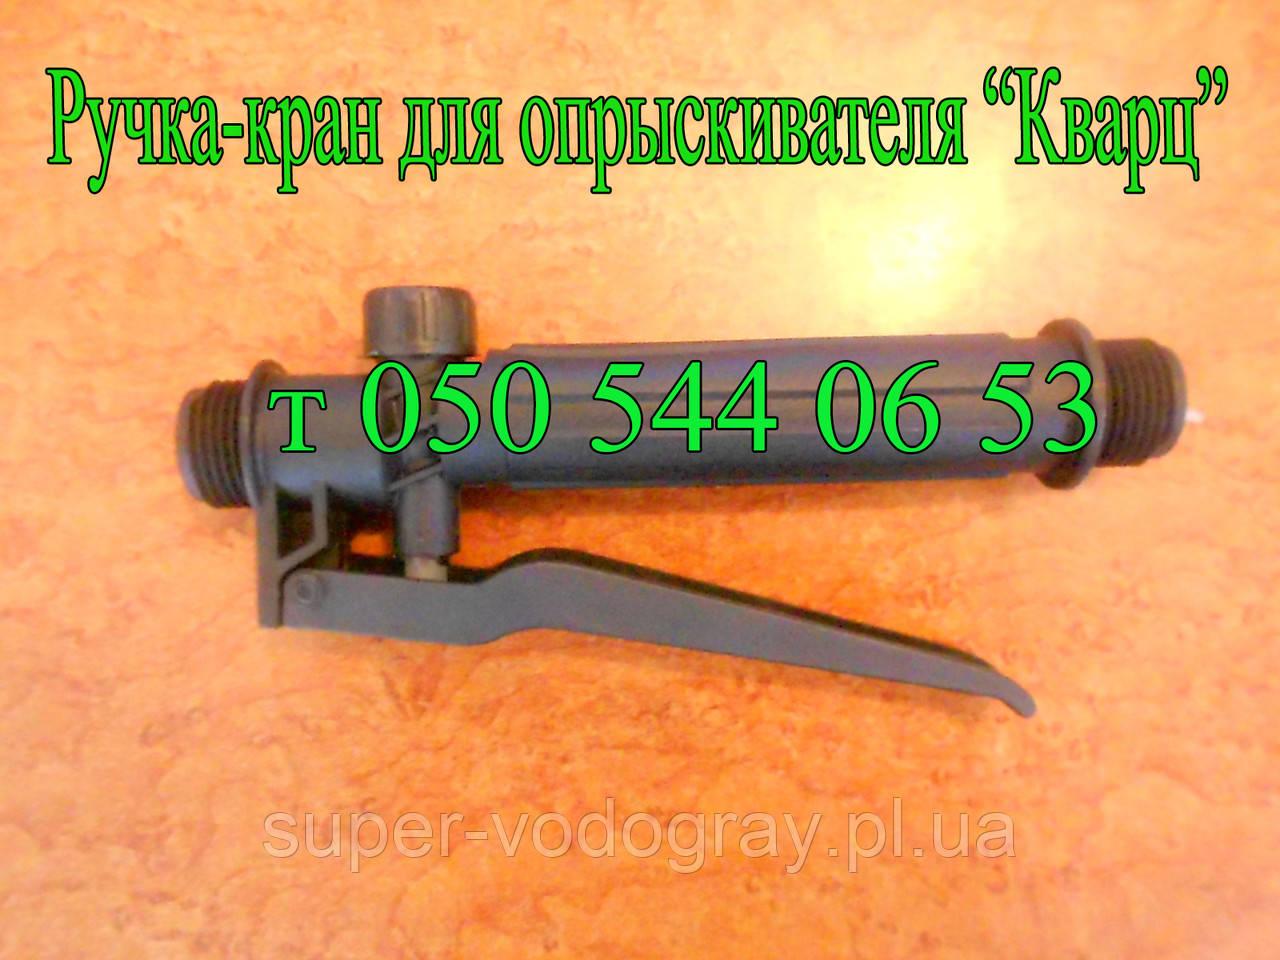 Ручка-кран для опрыскивателя Кварц-Профи